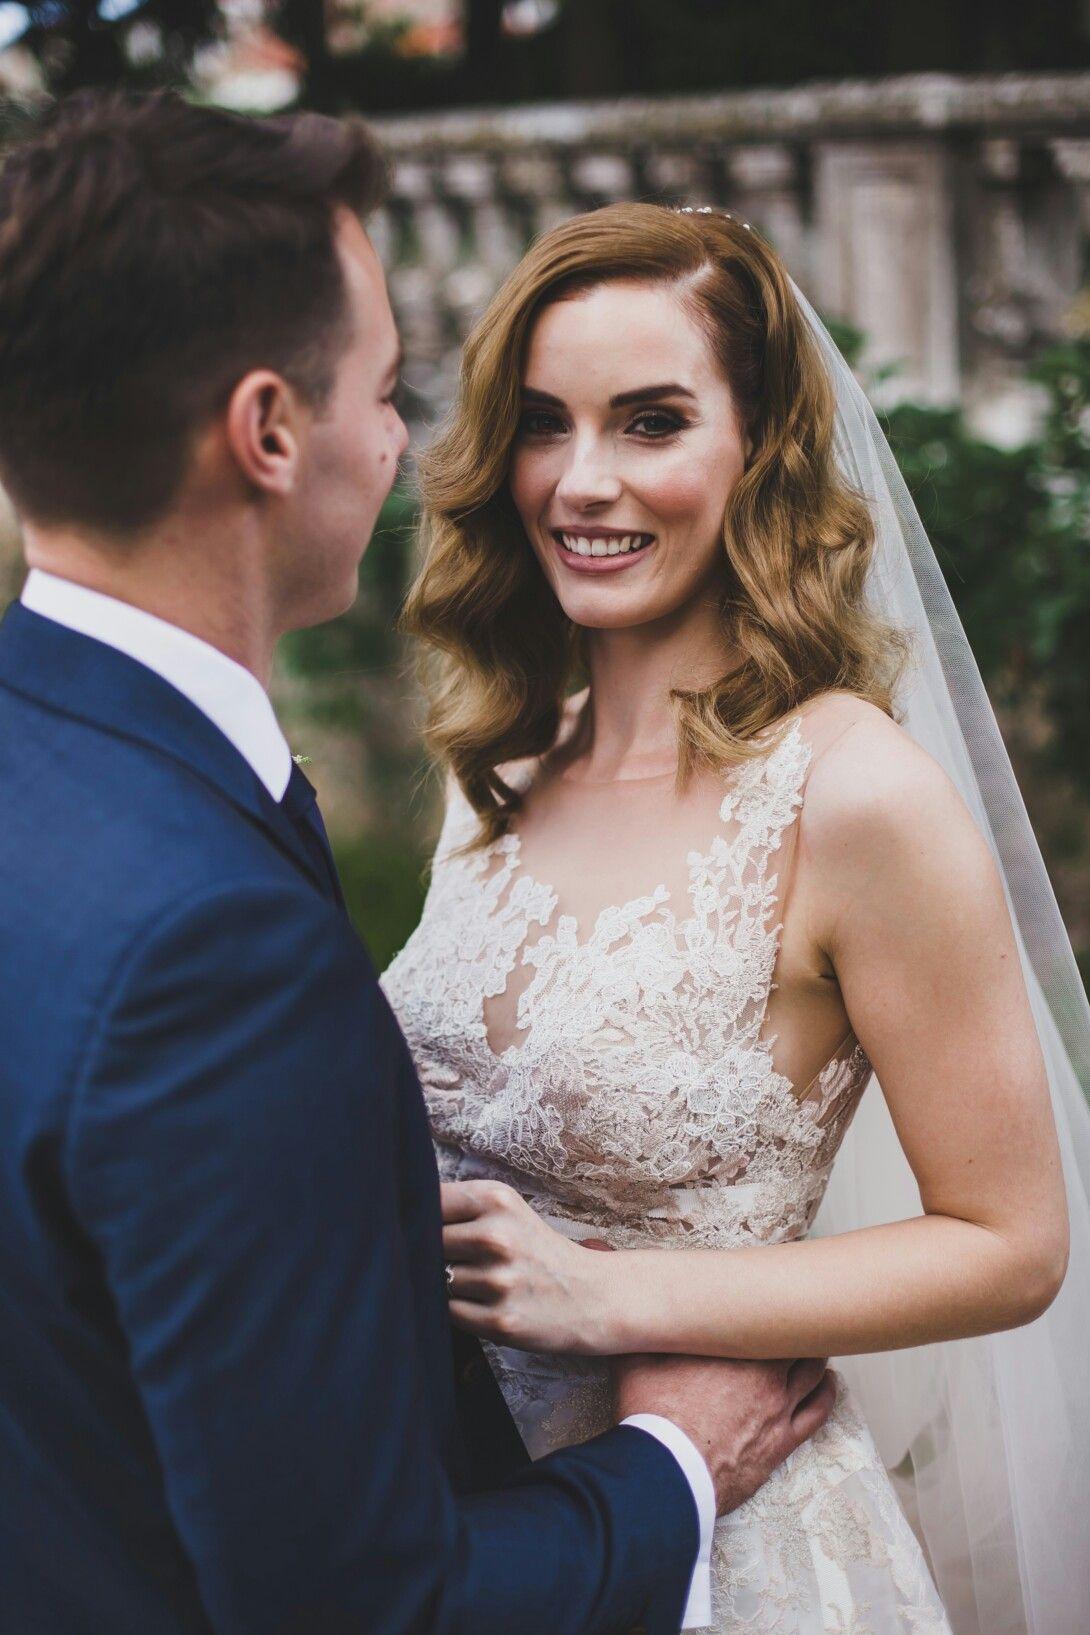 """Bridal Perfection"" Photo: Jesus Caballero Wedding planner: Something Borrowed Hairstylist: Dorota Santos Hairstylist Makeup: Jordana Carraça Stylist and Makeup Artist"